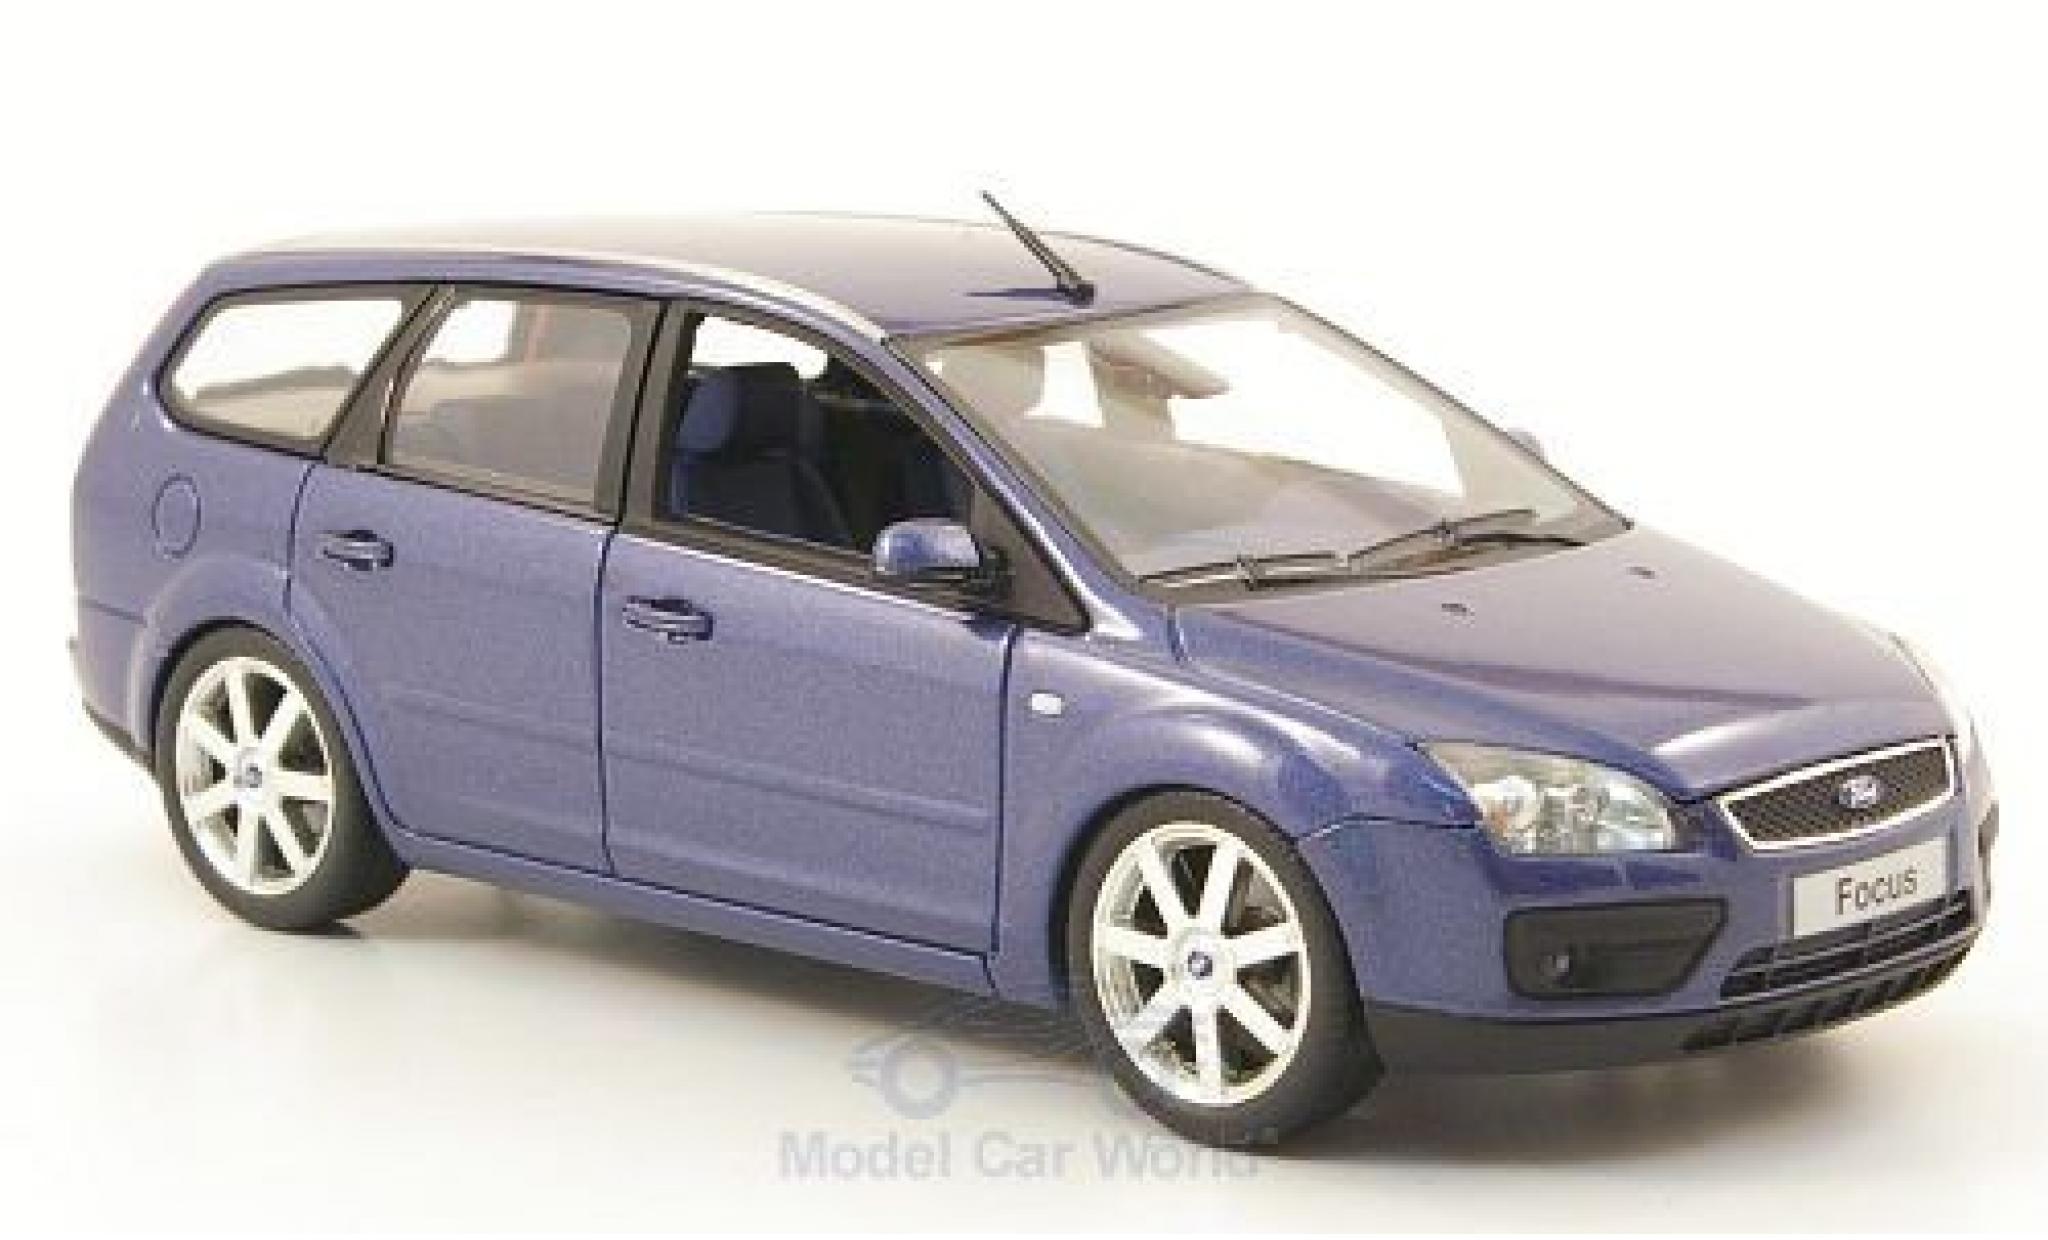 Ford Focus 1/43 Minichamps Turnier metallise bleue 2006